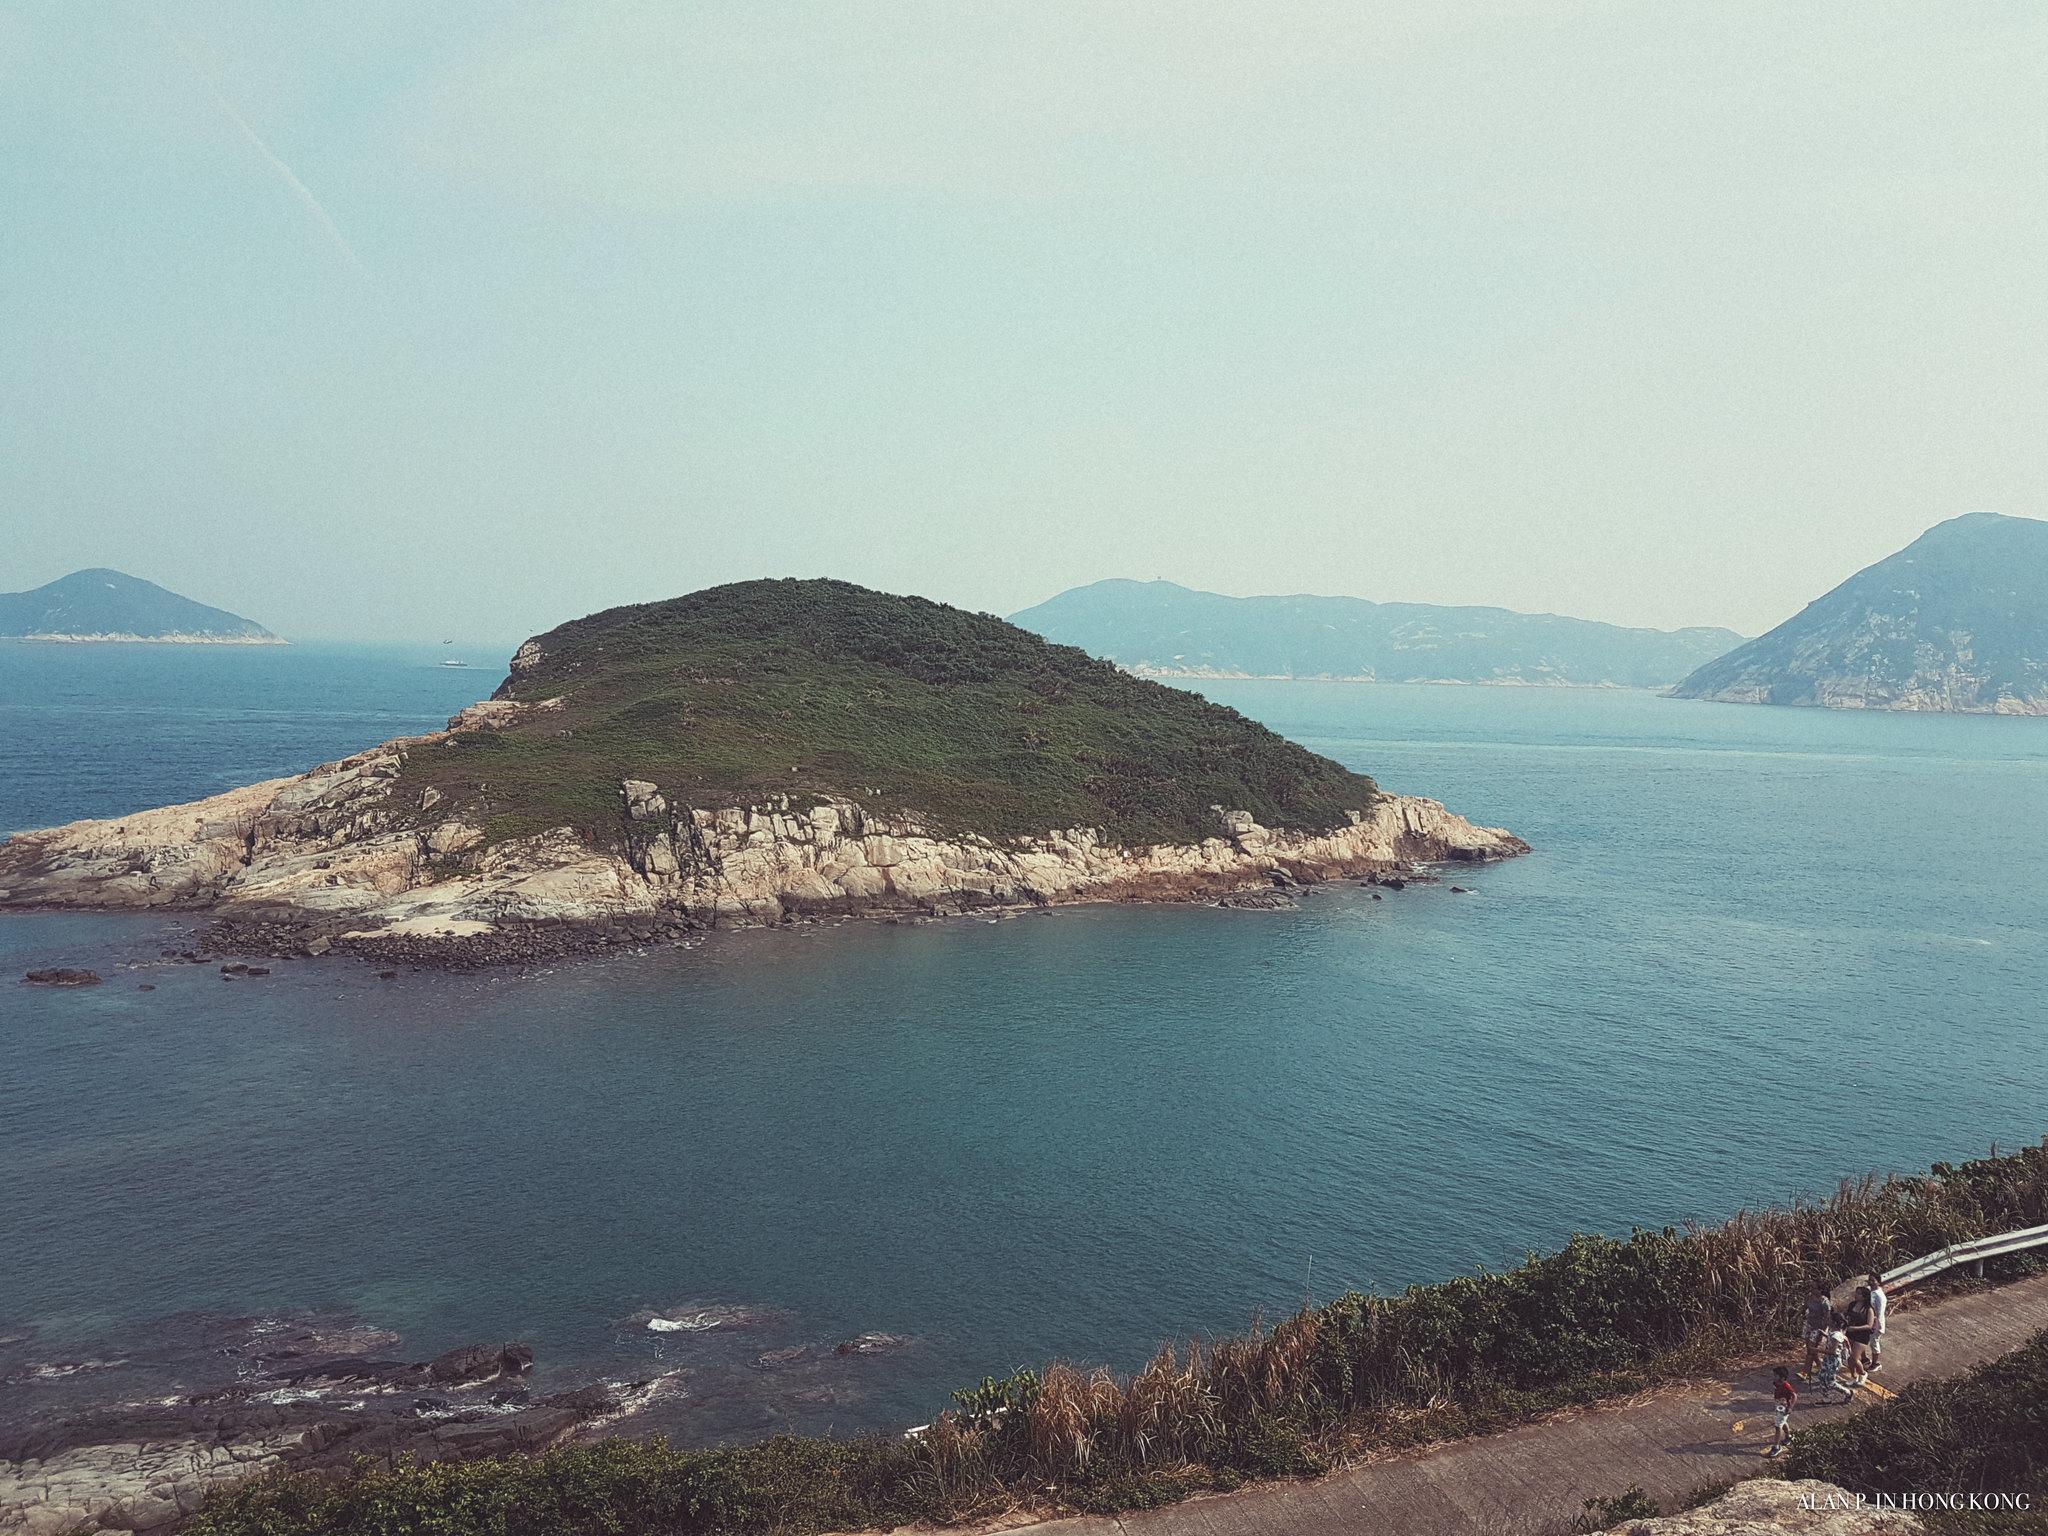 Island by an island